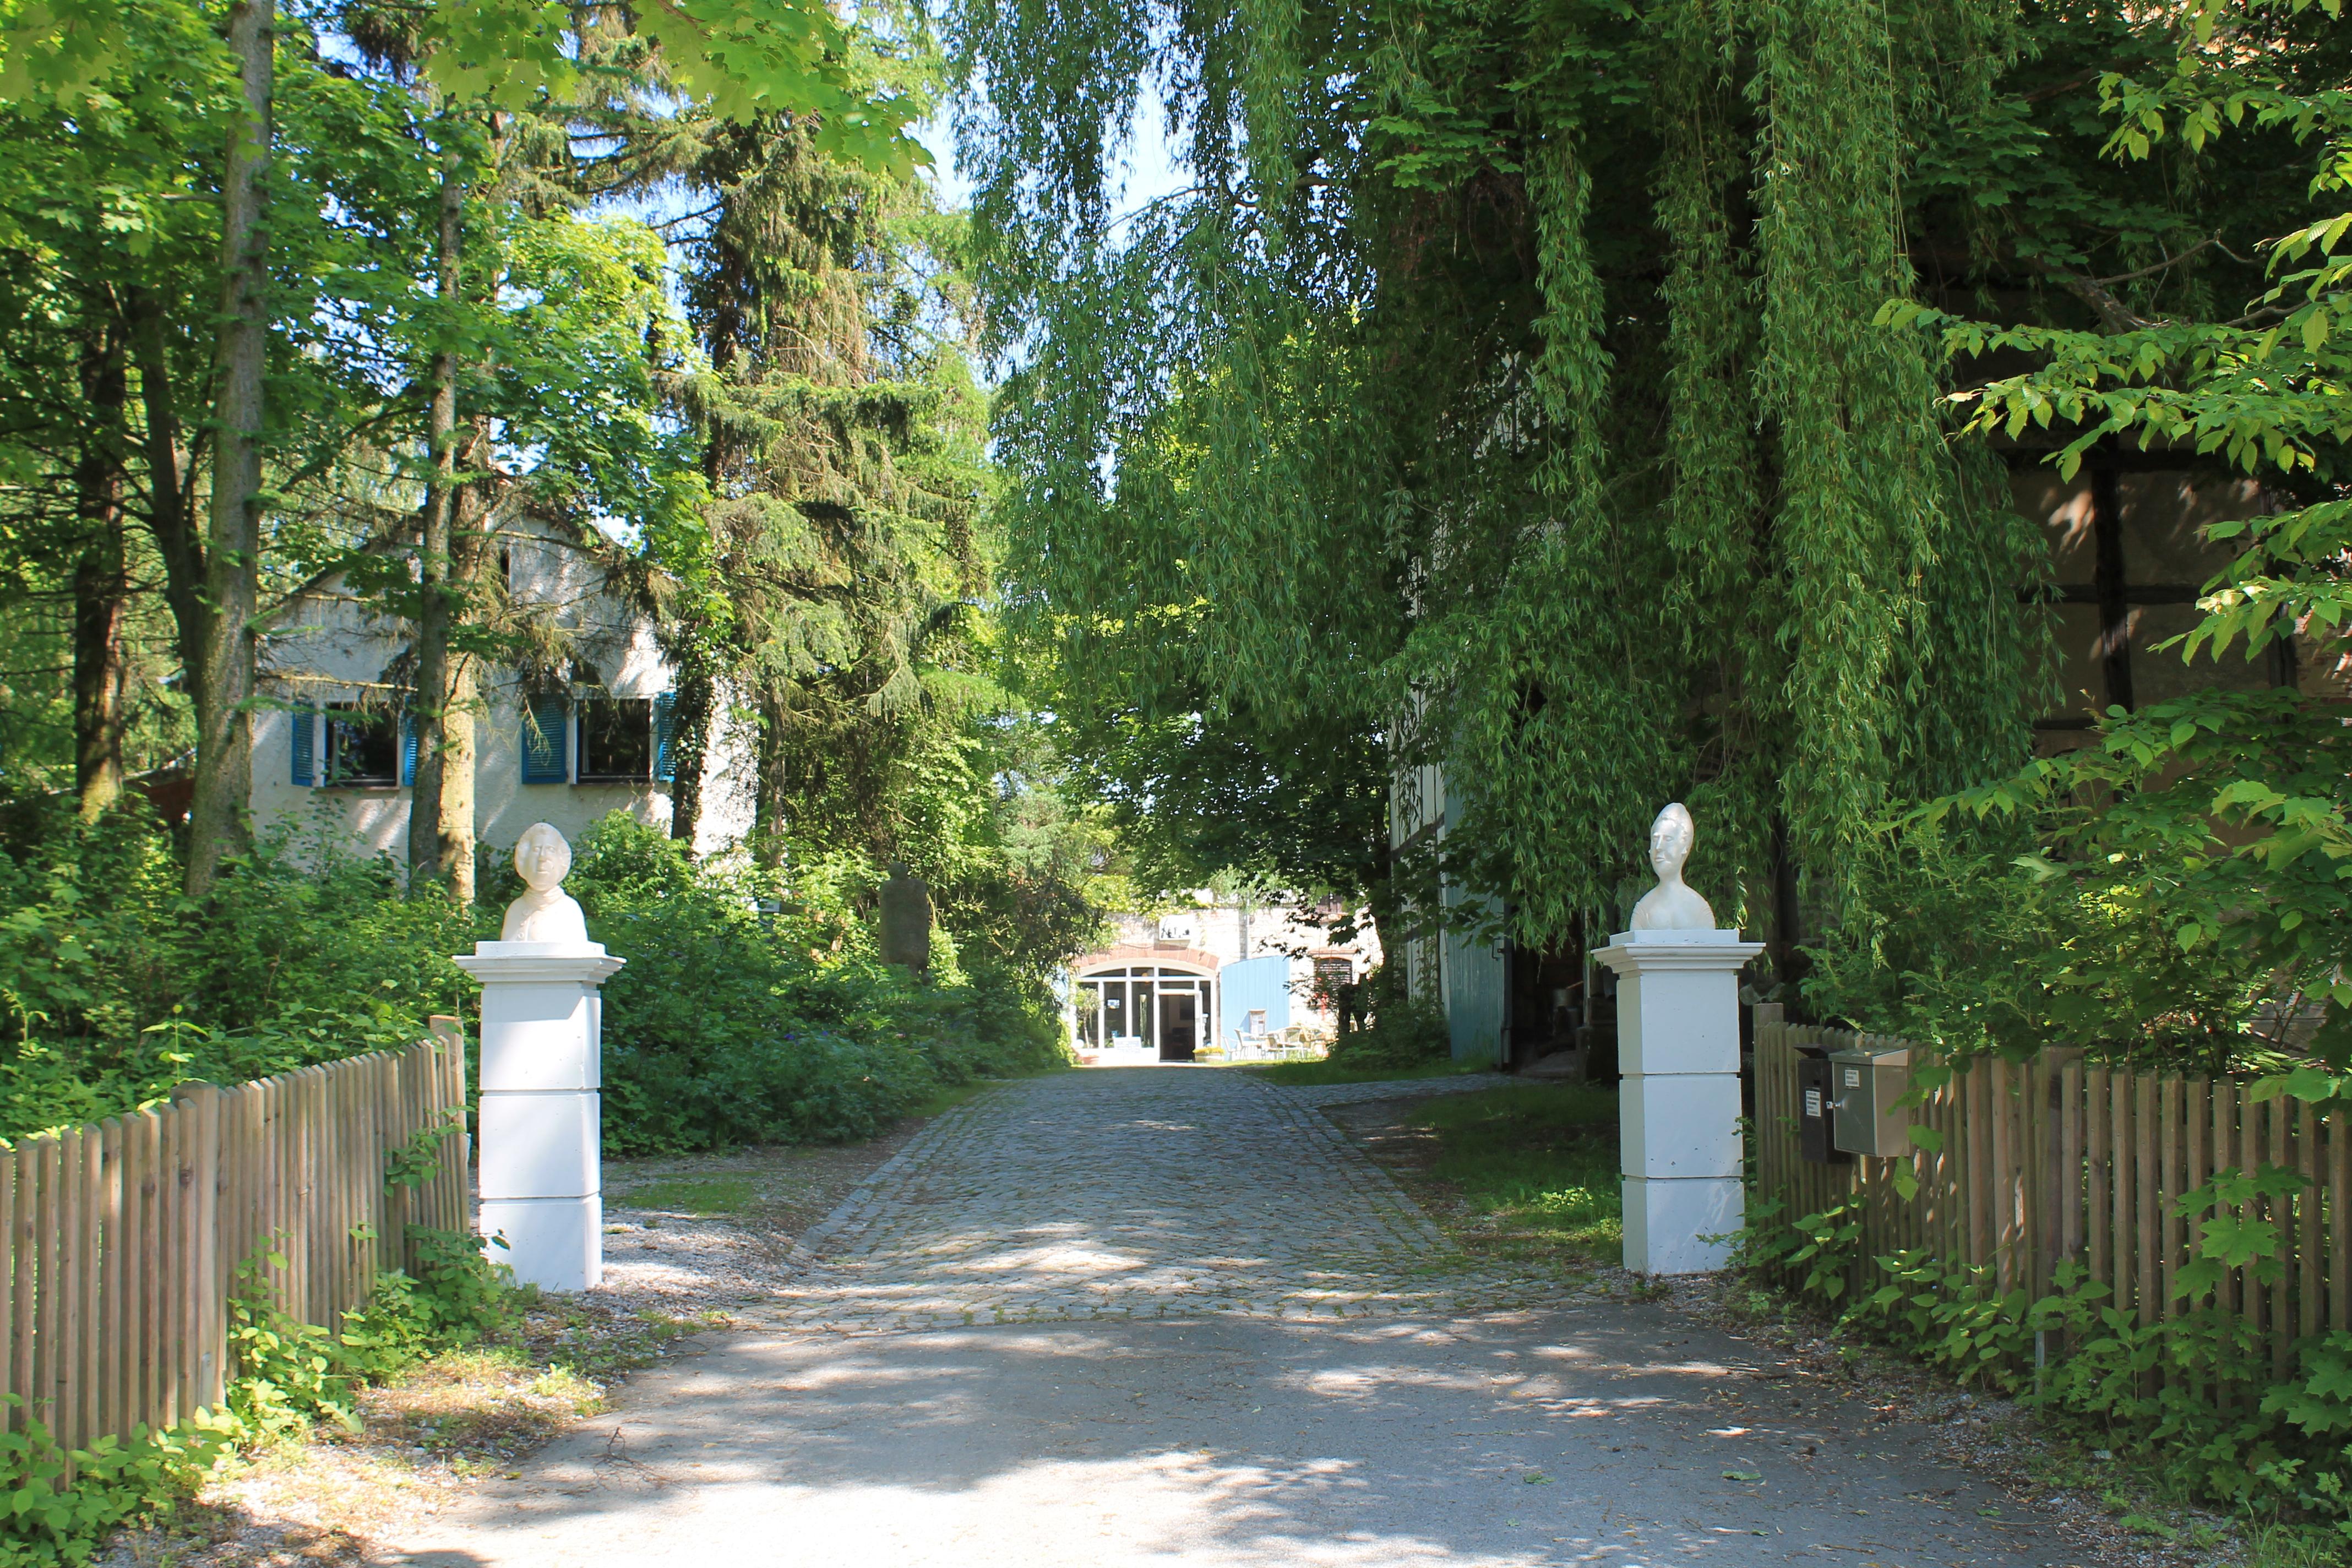 Klosterhof Brunshausen - Eingang zum Hof